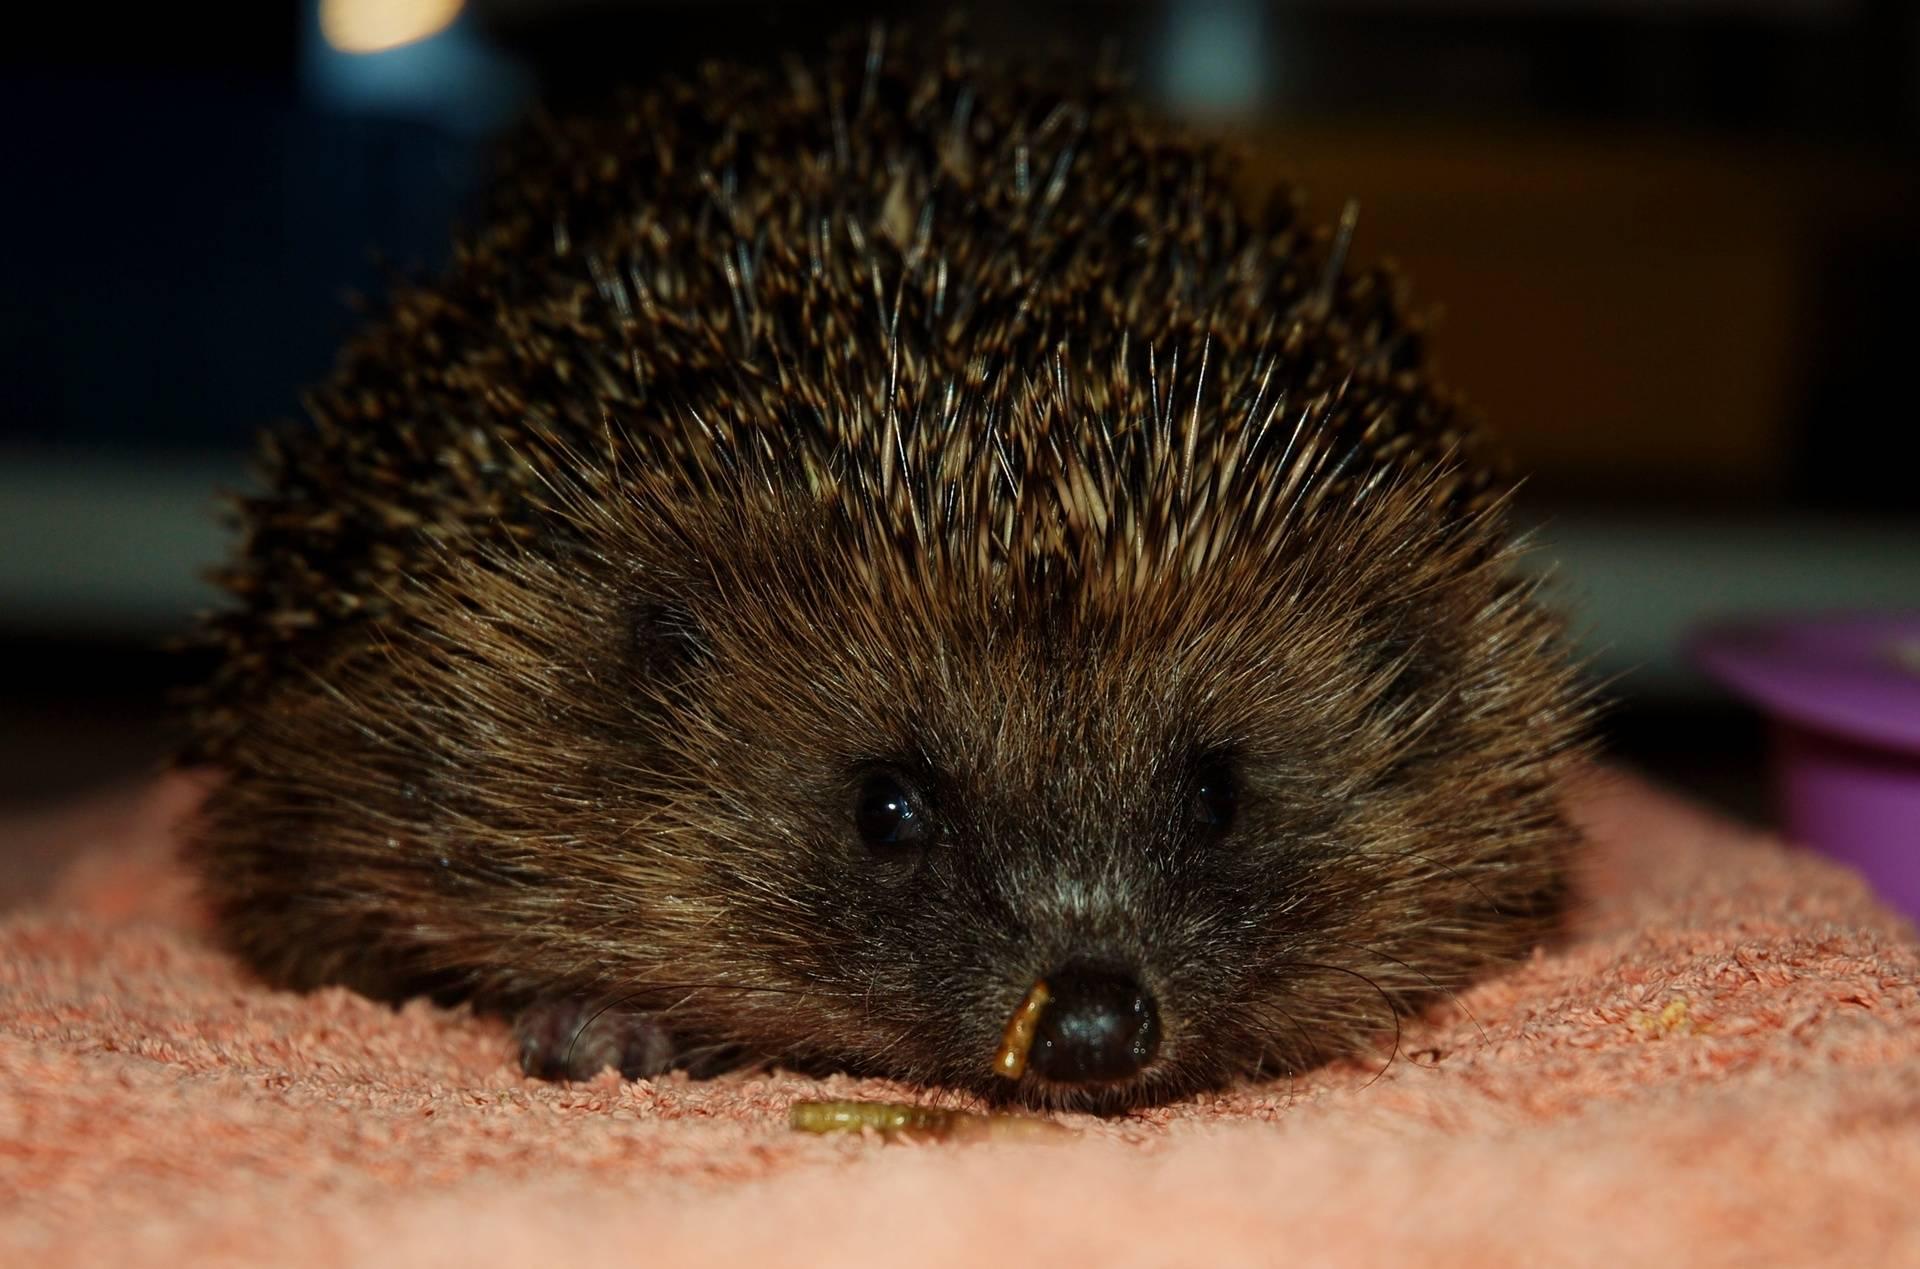 Adult Hedgehog